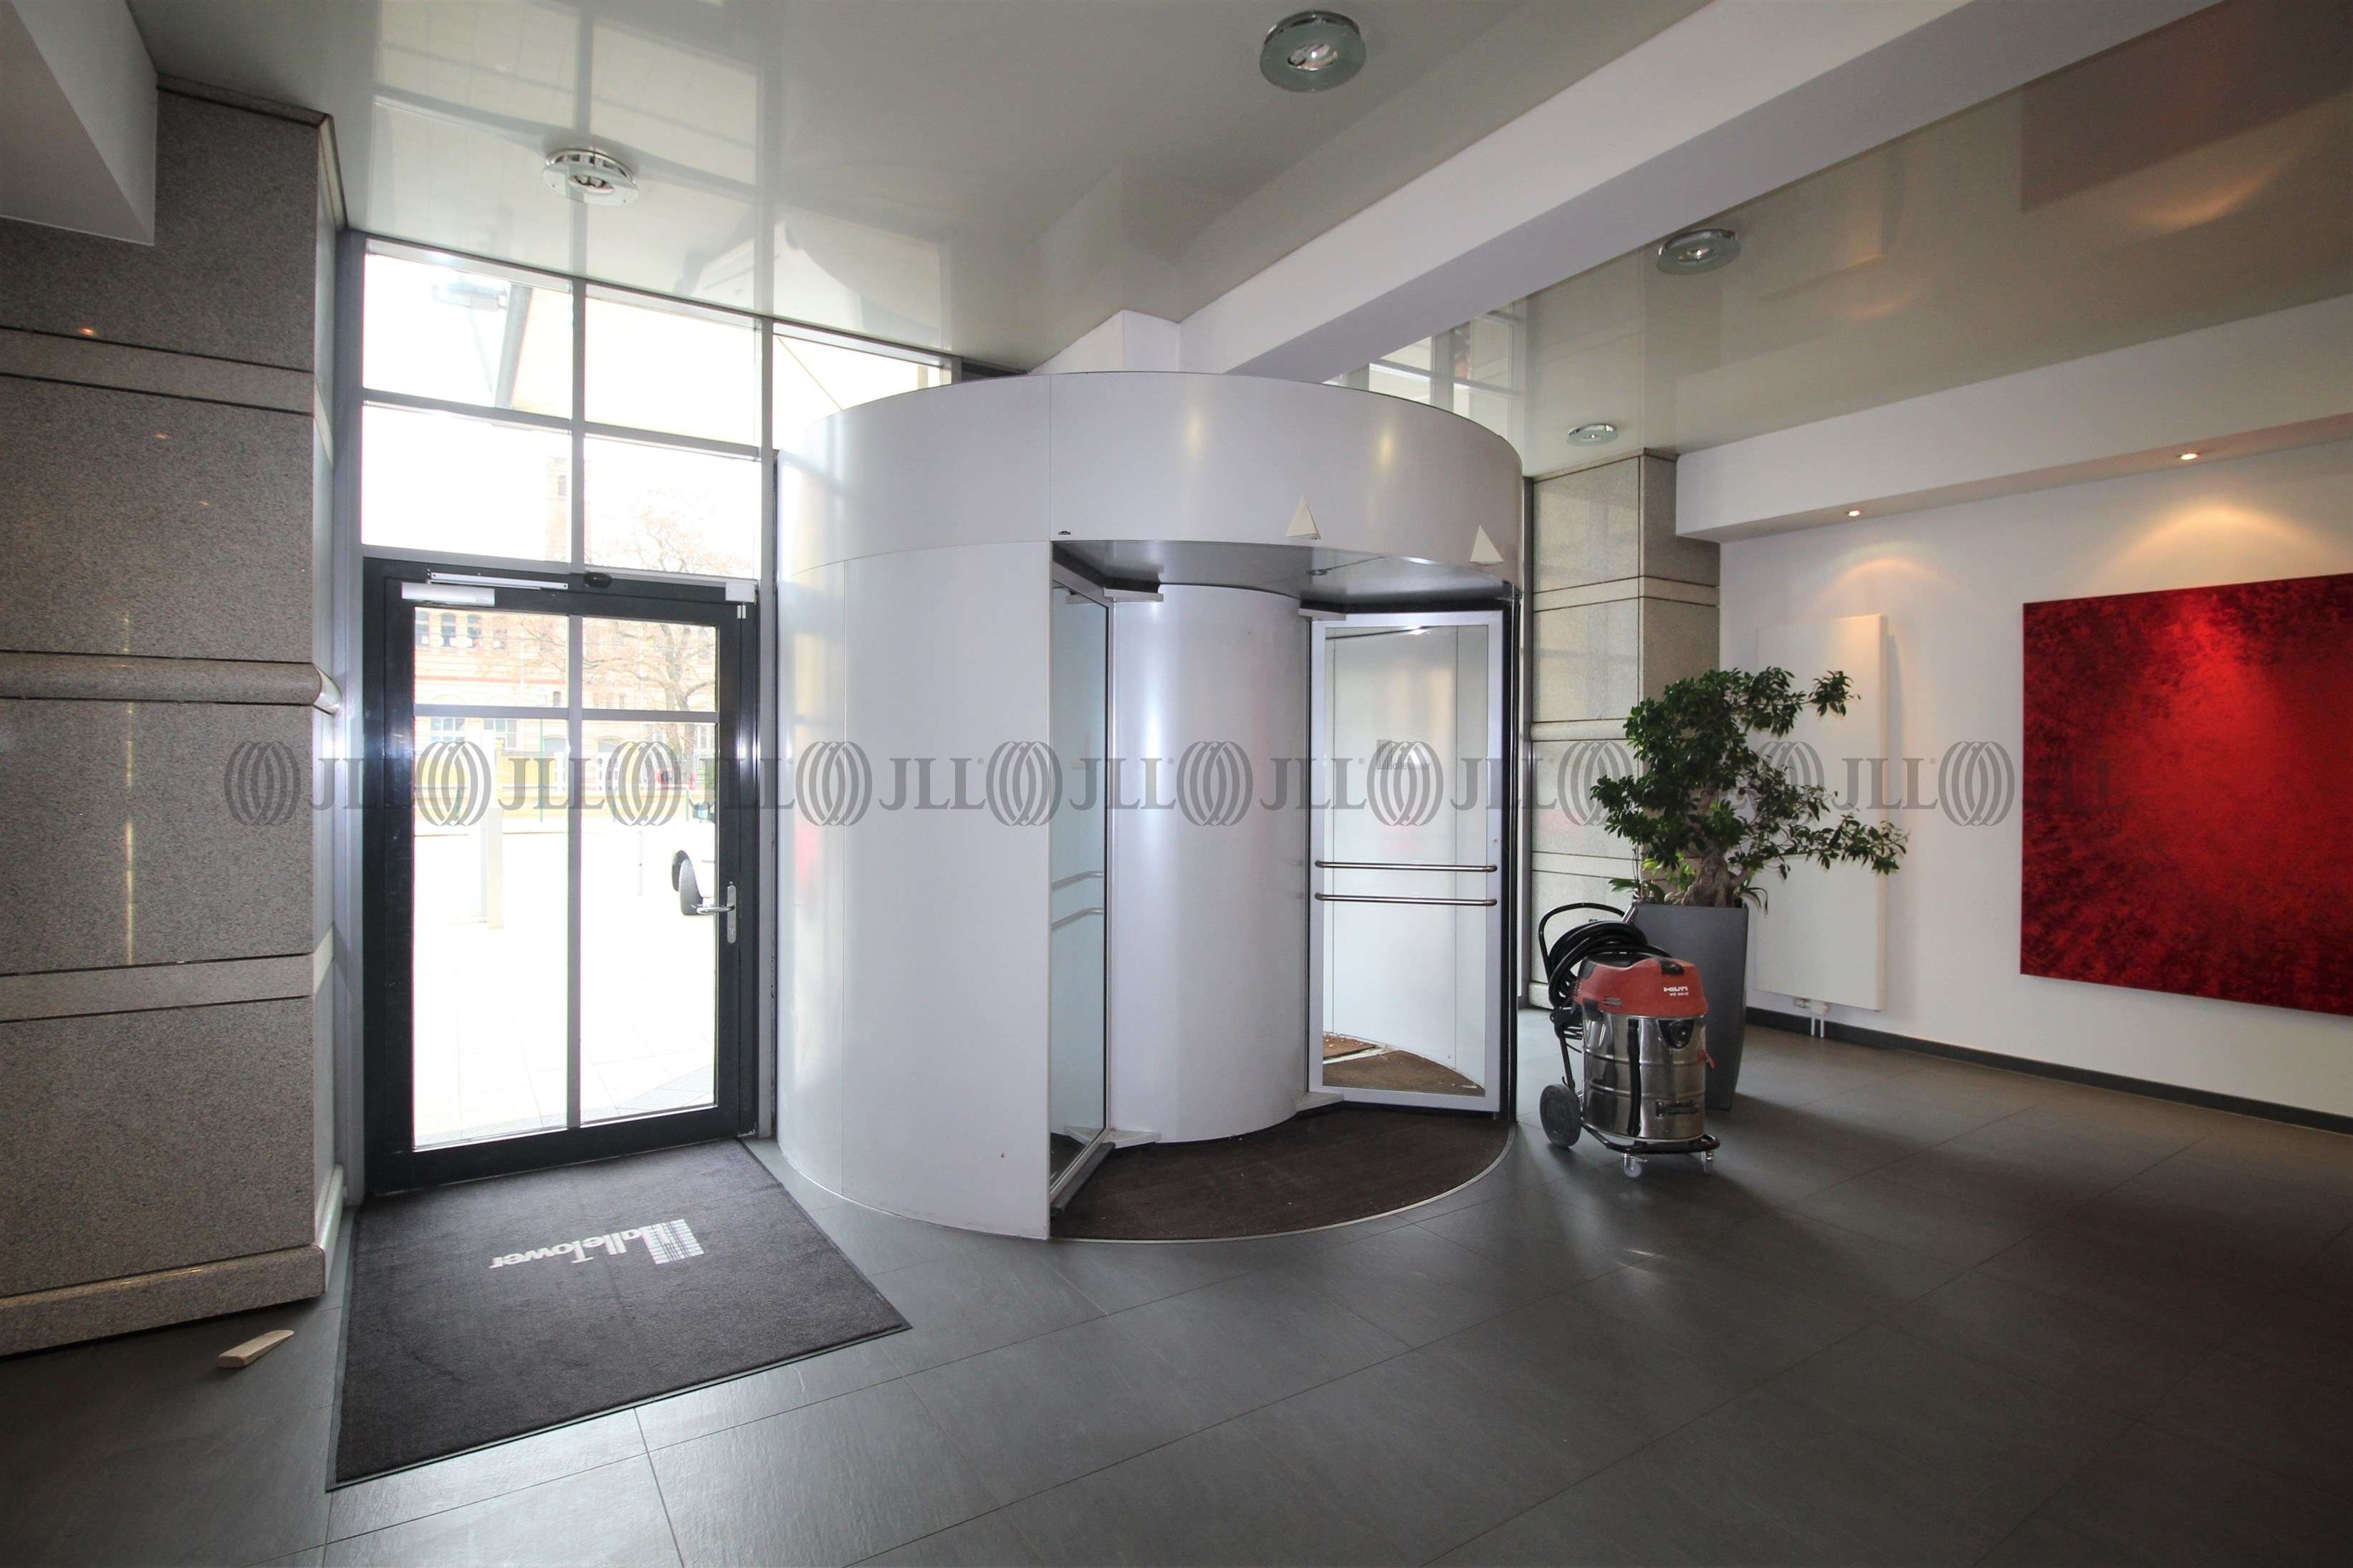 Büros Halle (saale), 06112 - Büro - Halle (Saale), Innenstadt - B1699 - 10080734